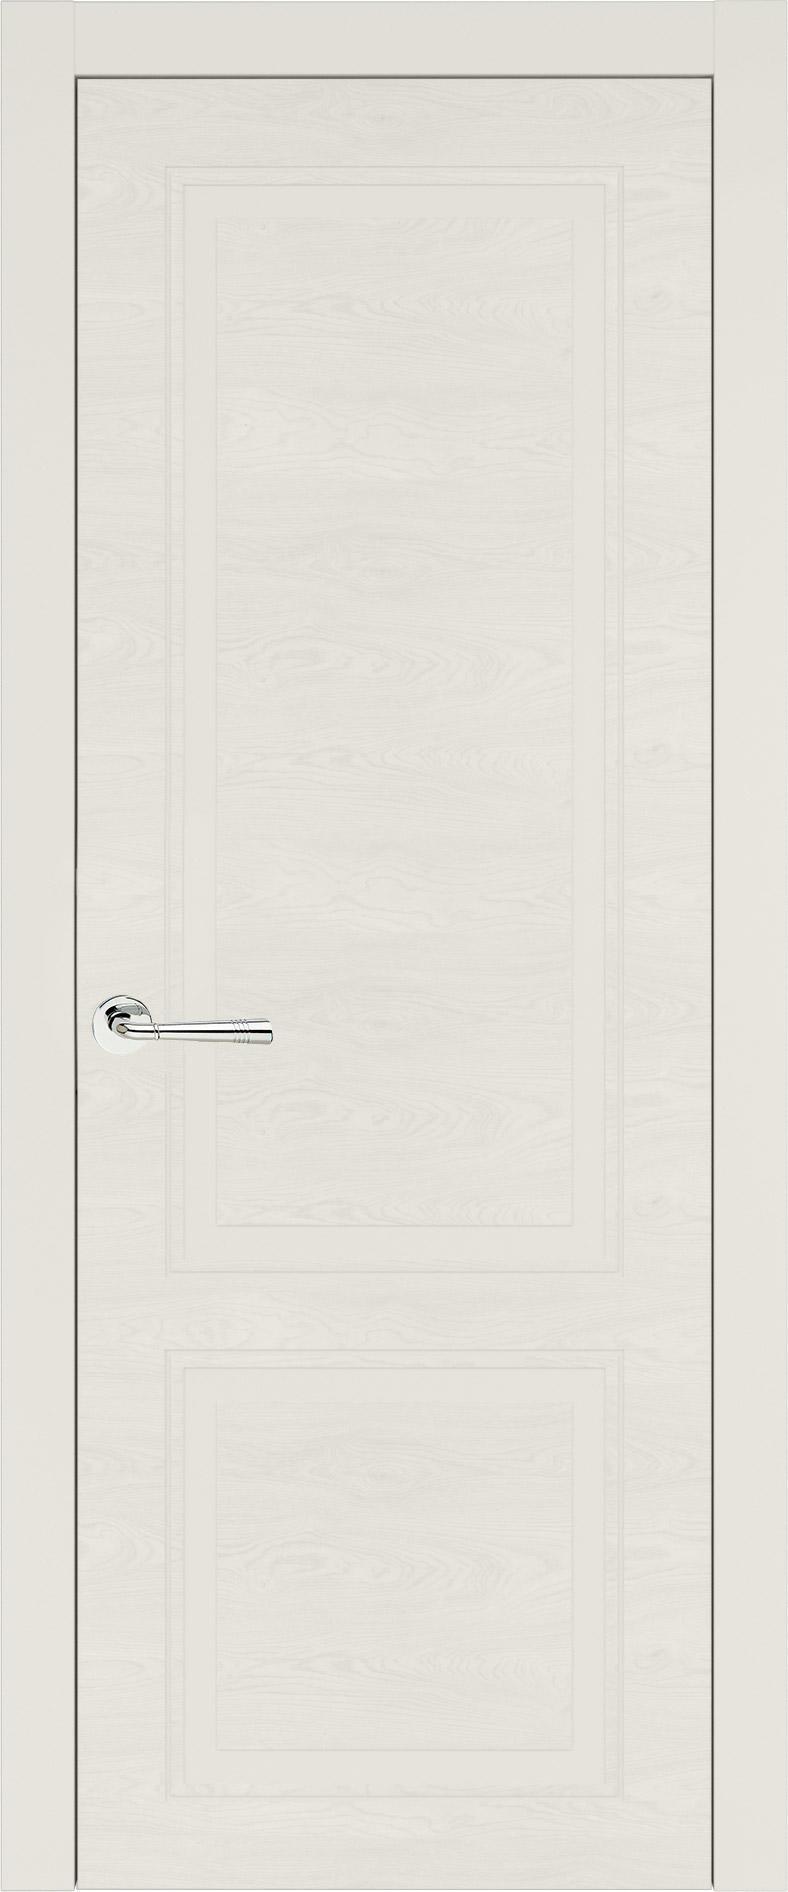 Dinastia Neo Classic цвет - Бежевая эмаль по шпону (RAL 9010) Без стекла (ДГ)